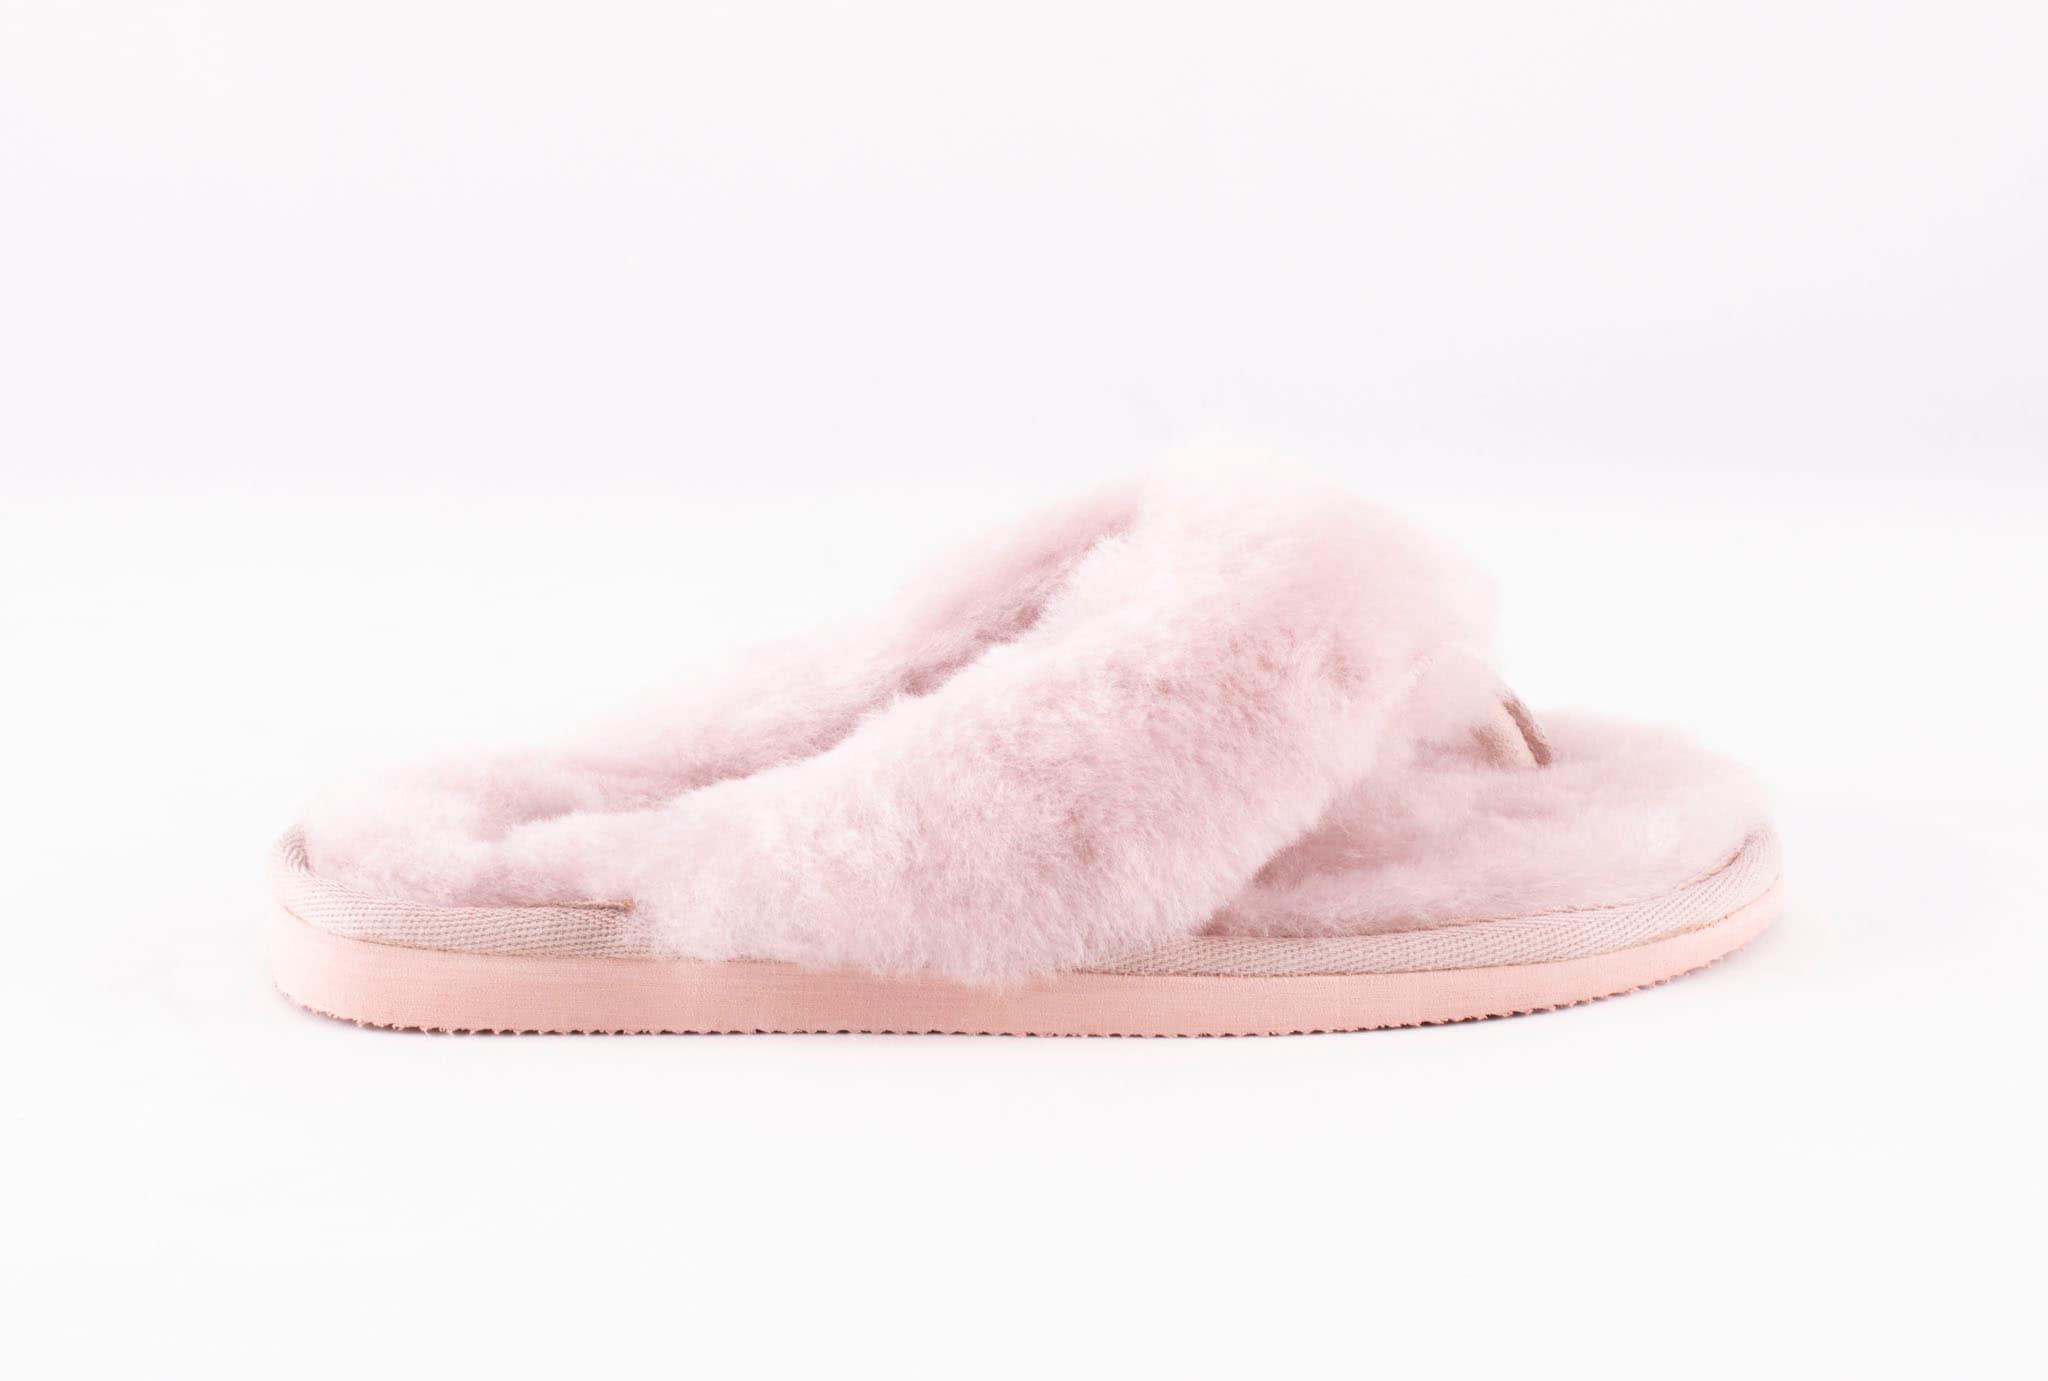 Pernilla slippers